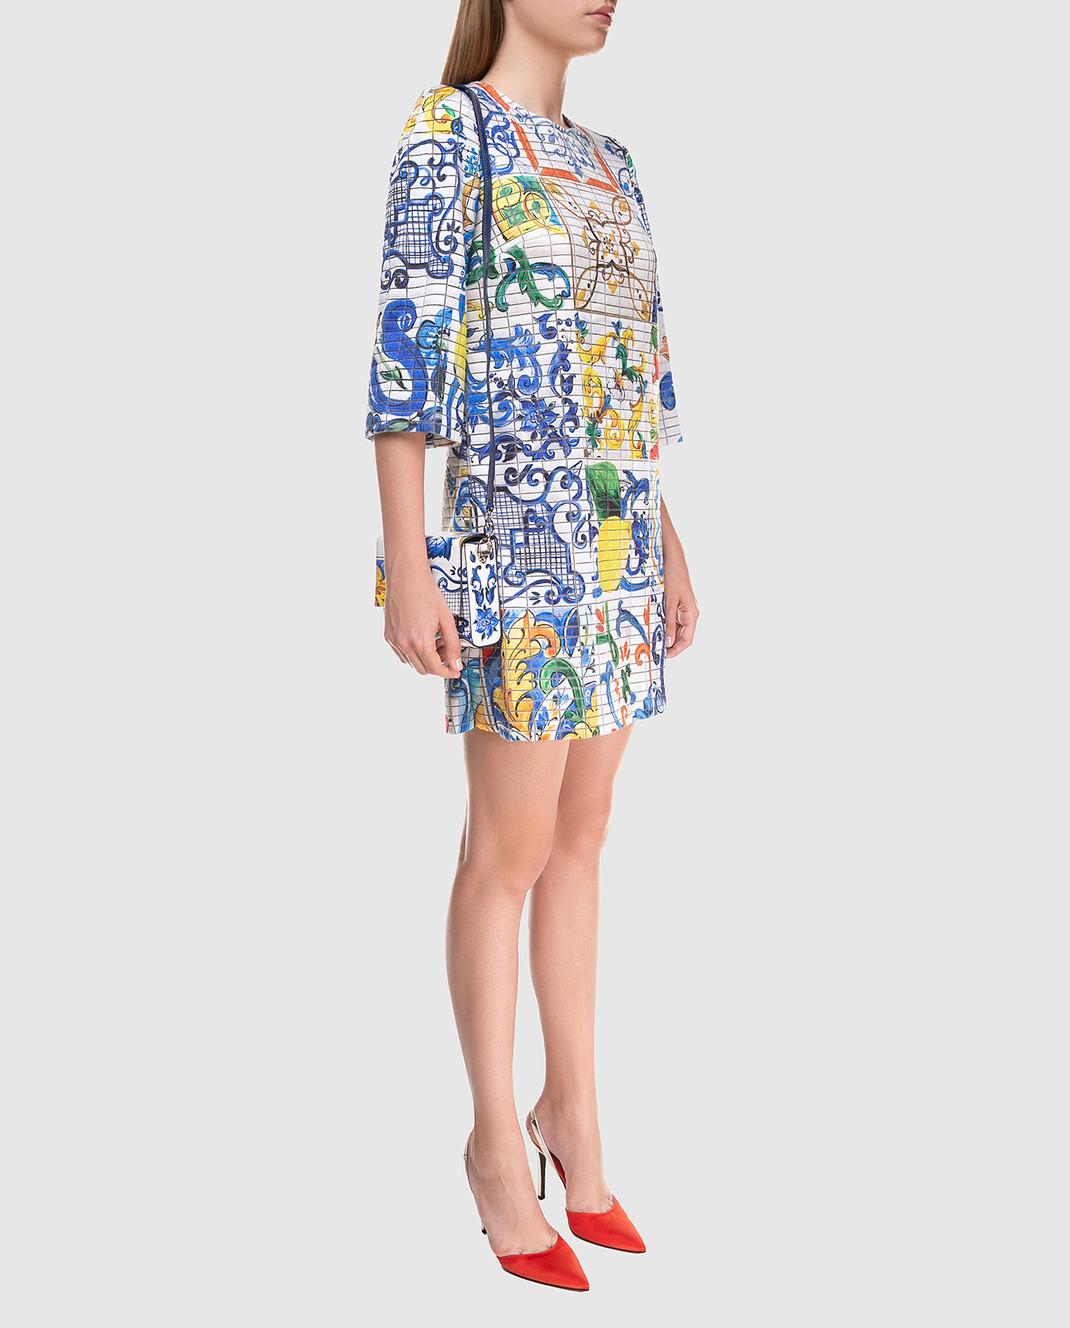 Dolce&Gabbana Платье из шелка F69U8THSMRW изображение 2